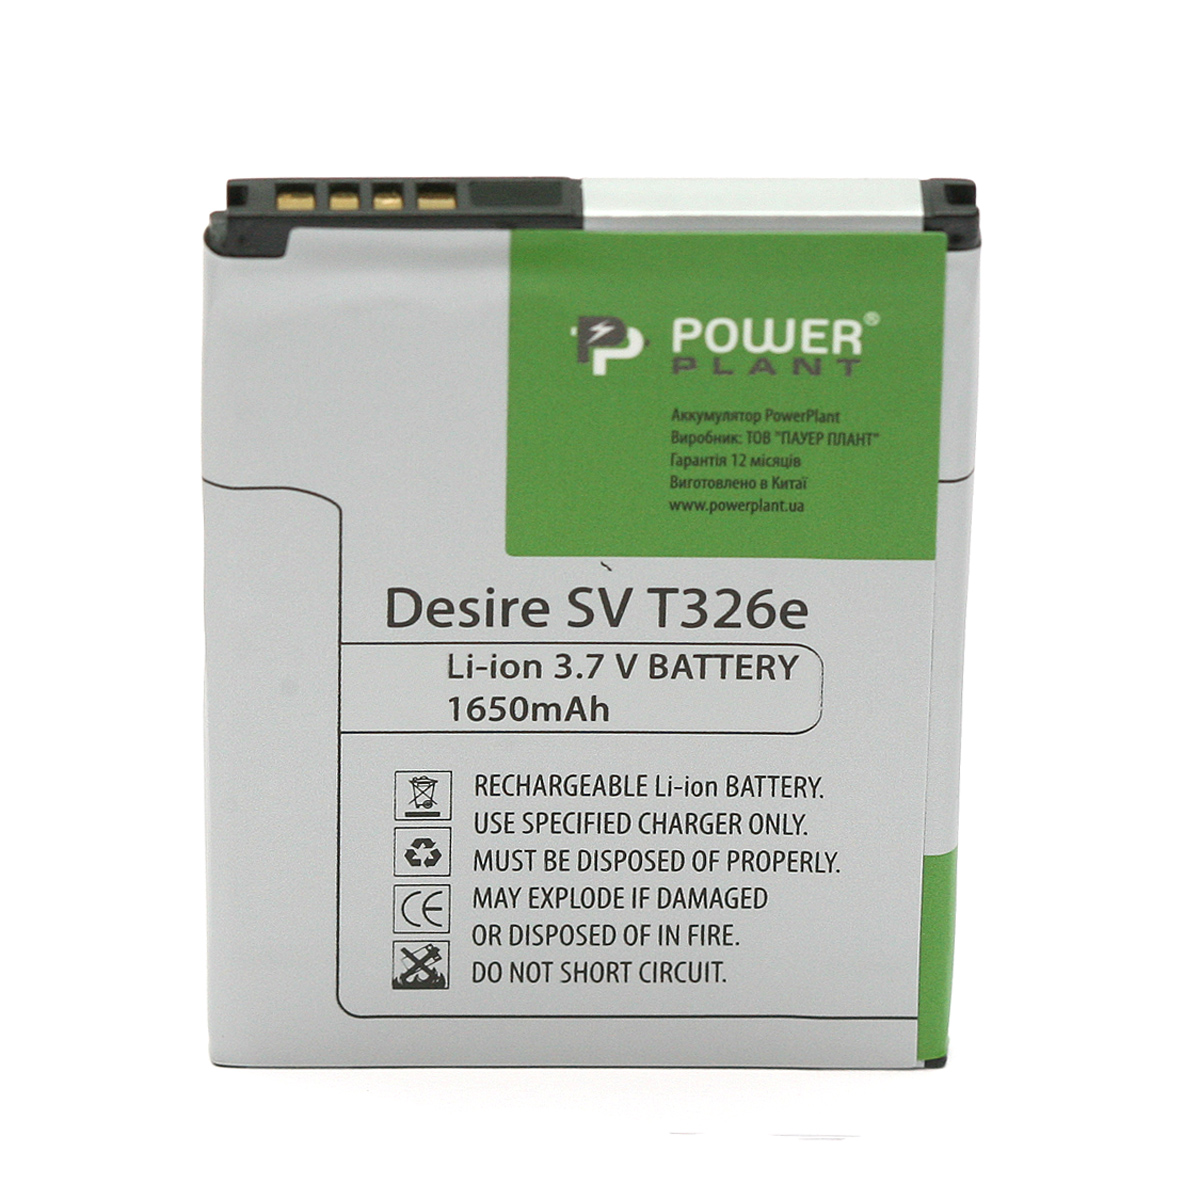 Купить Аккумулятор PowerPlant HTC Desire SV T326e (BA S910) 1650mAh